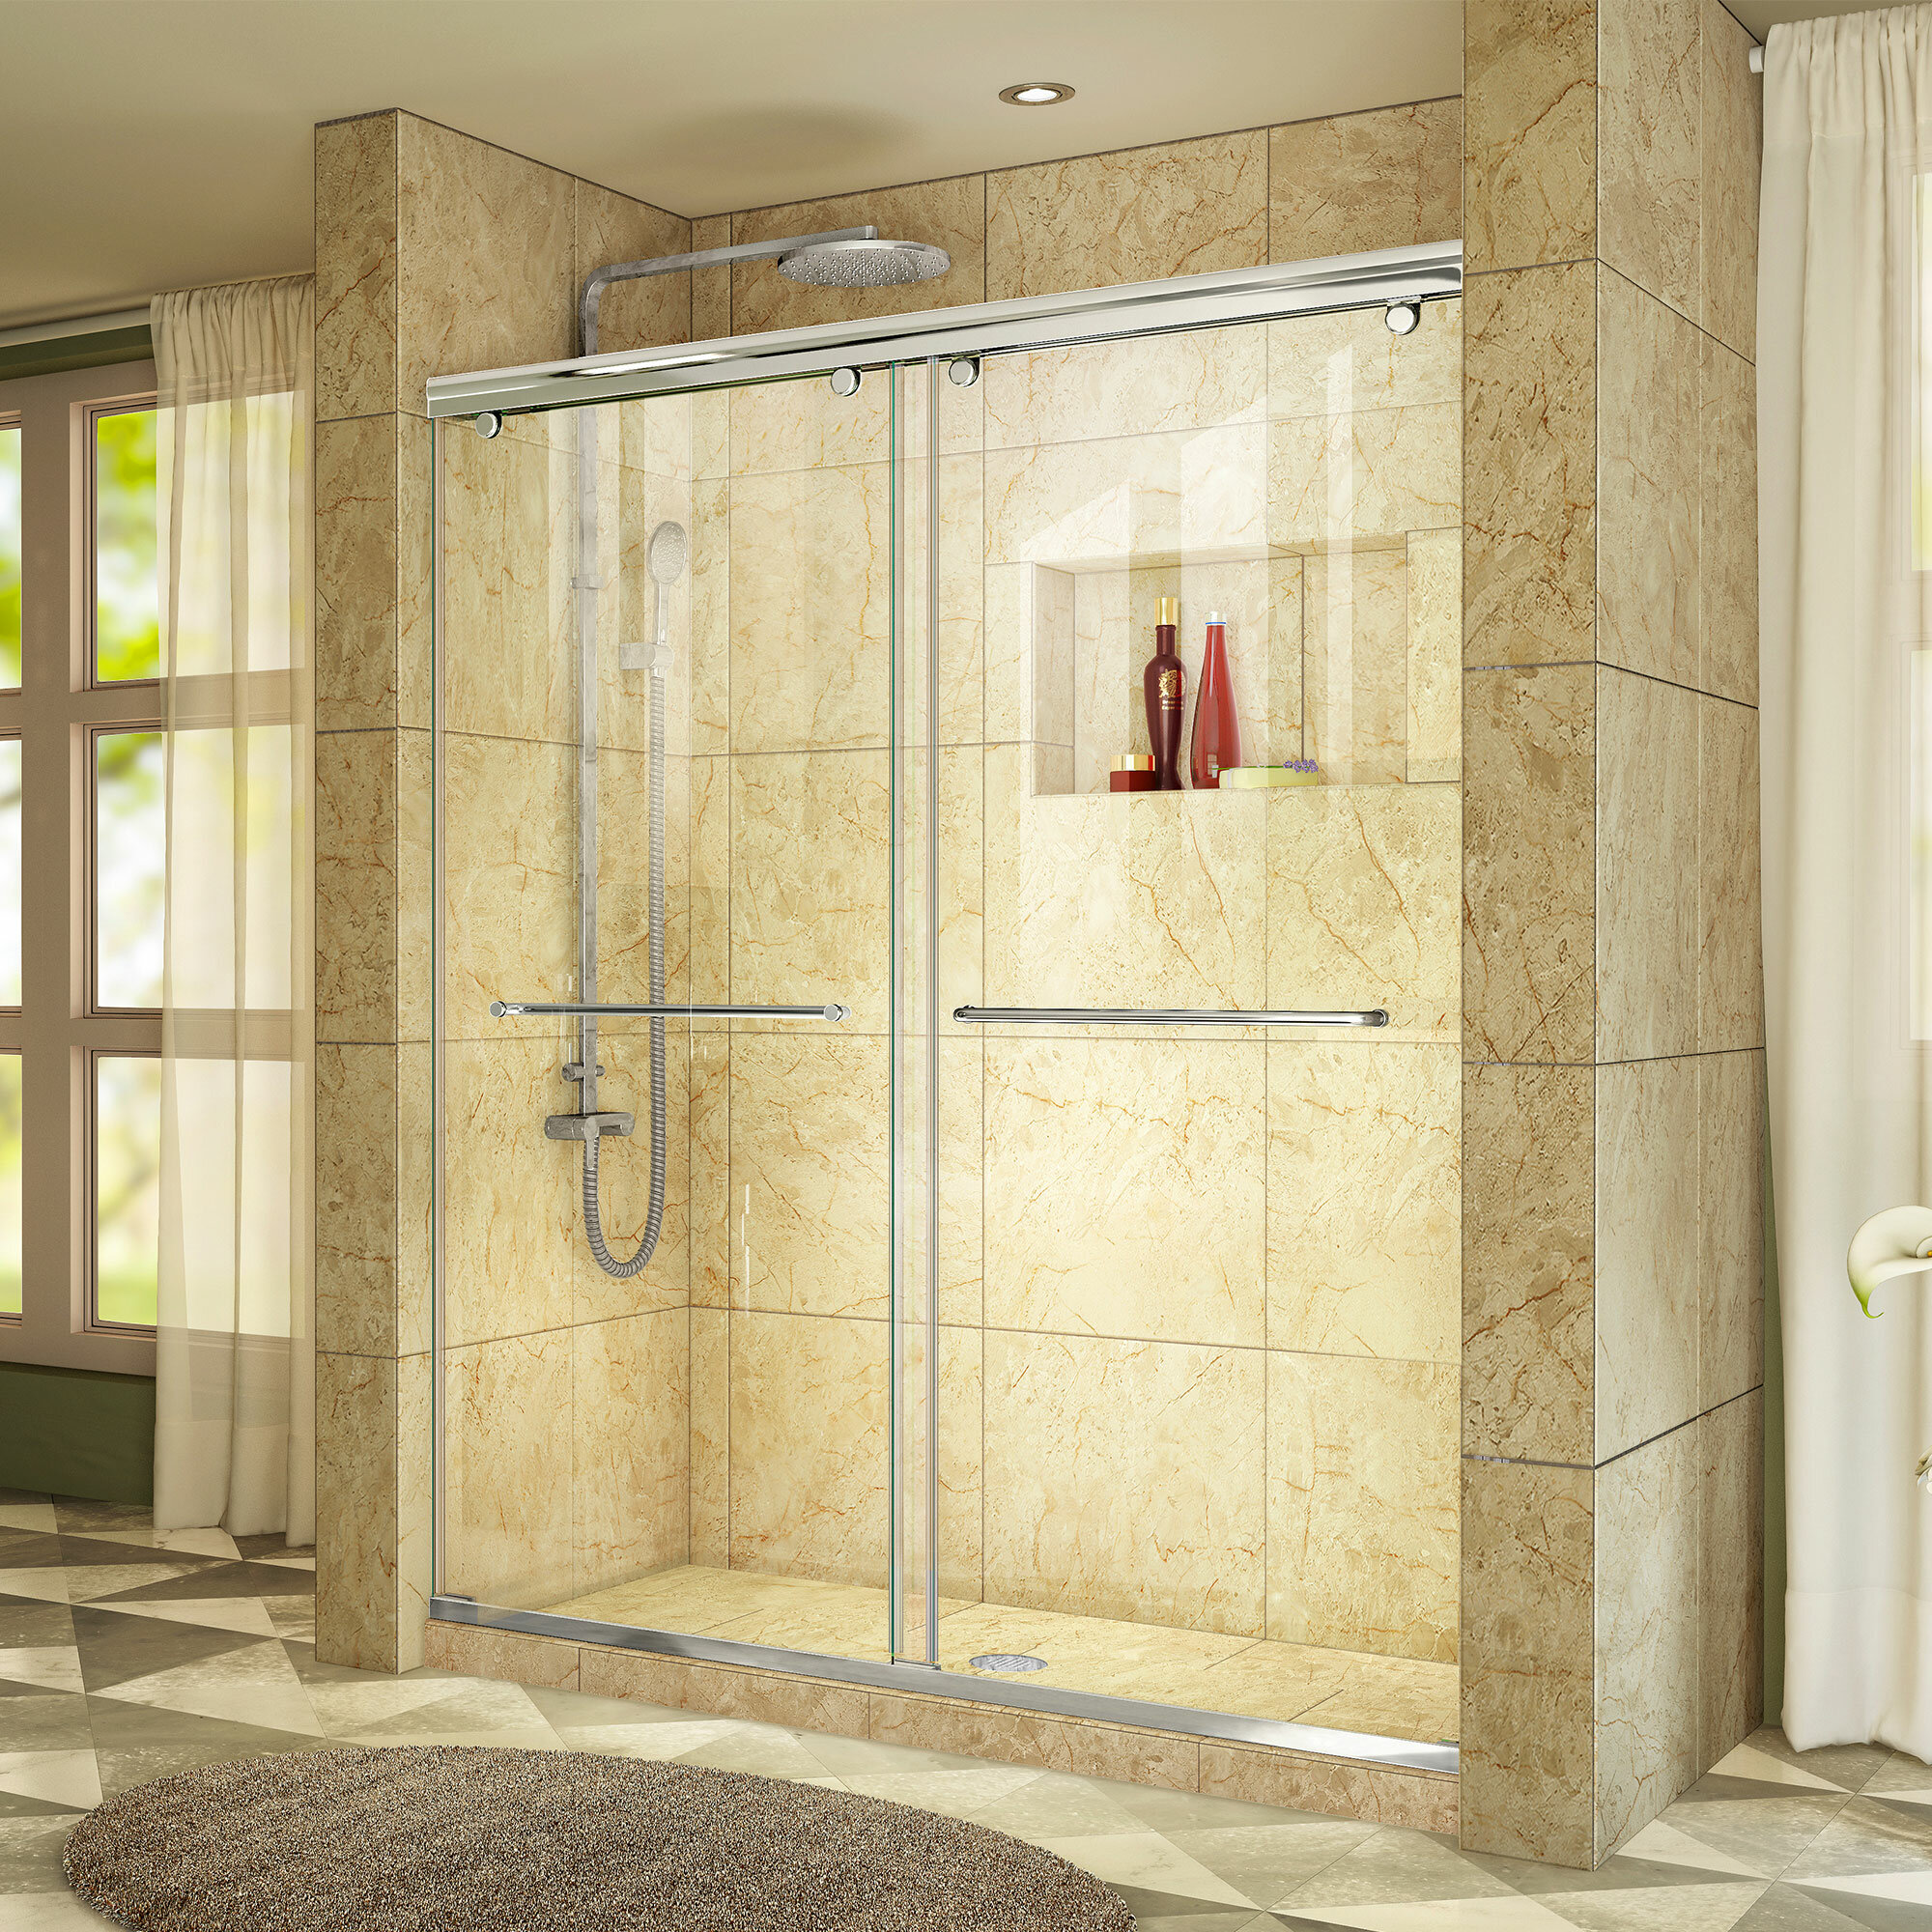 Charisma 60 X 76 Bypass Semi Frameless Shower Door With Clearmax Technology